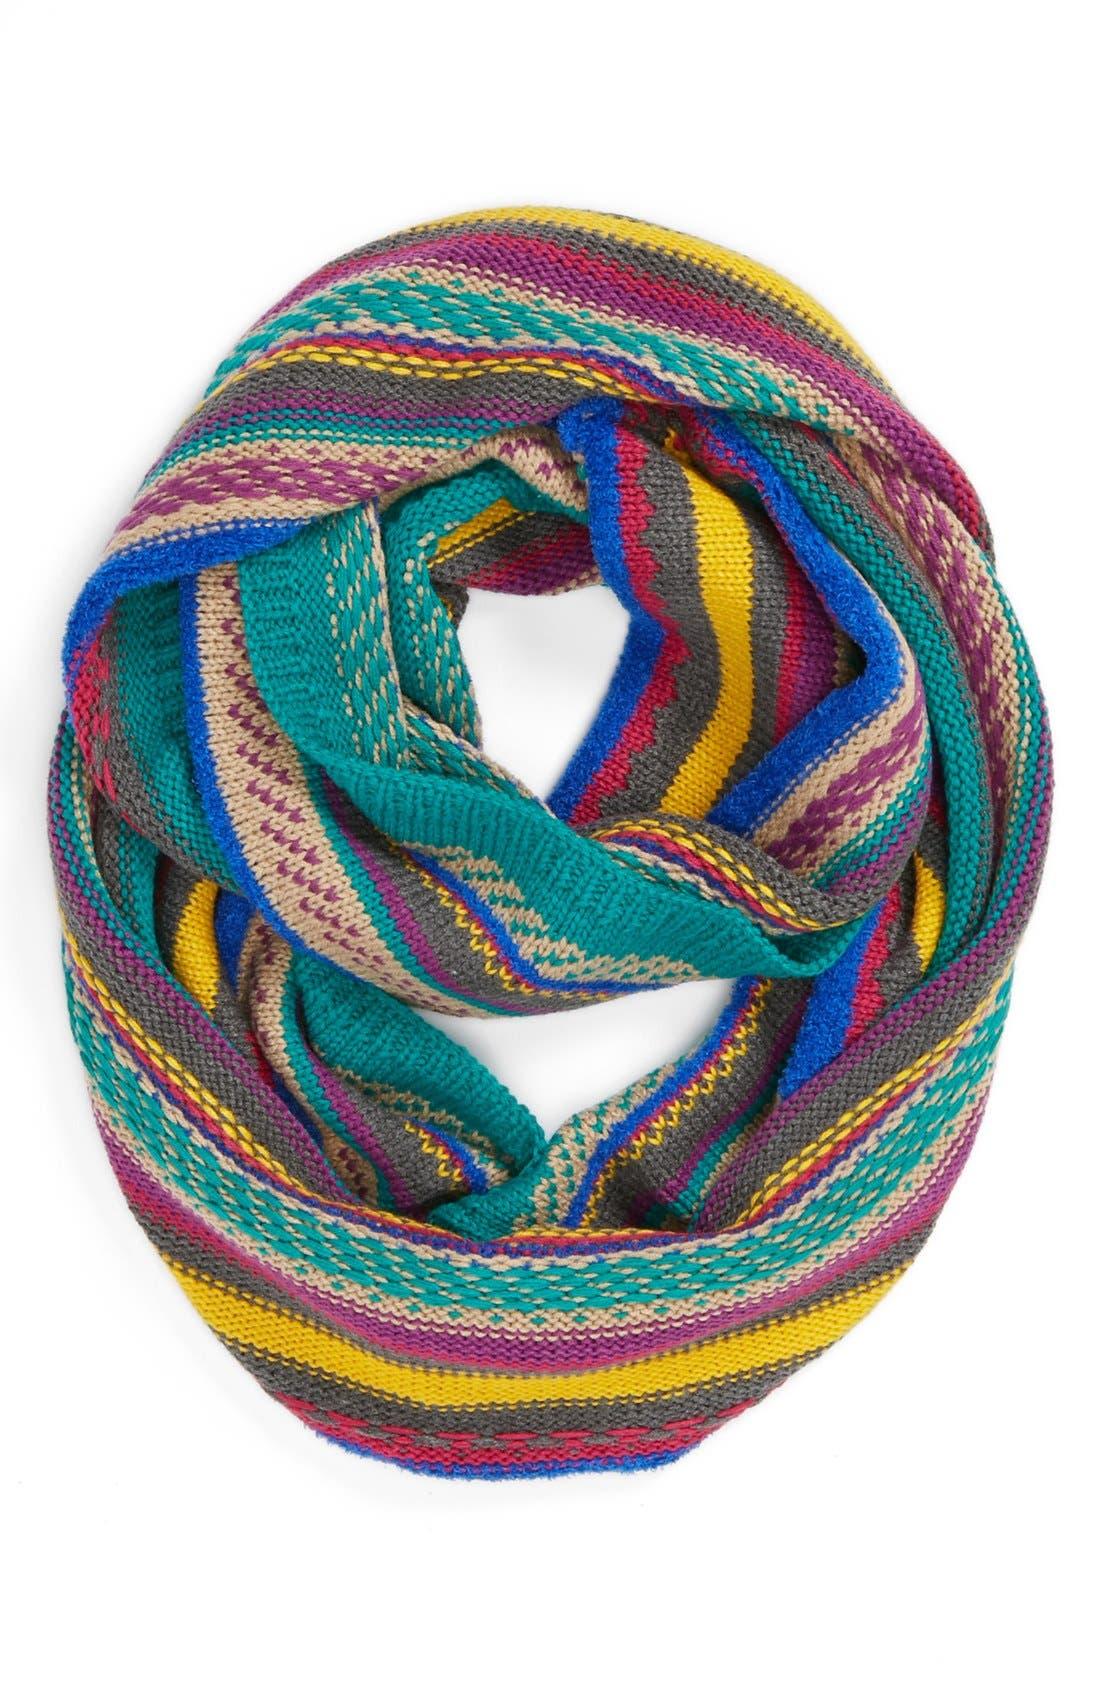 Alternate Image 1 Selected - Echo 'Nostalgic Stripe' Knit Infinity Scarf